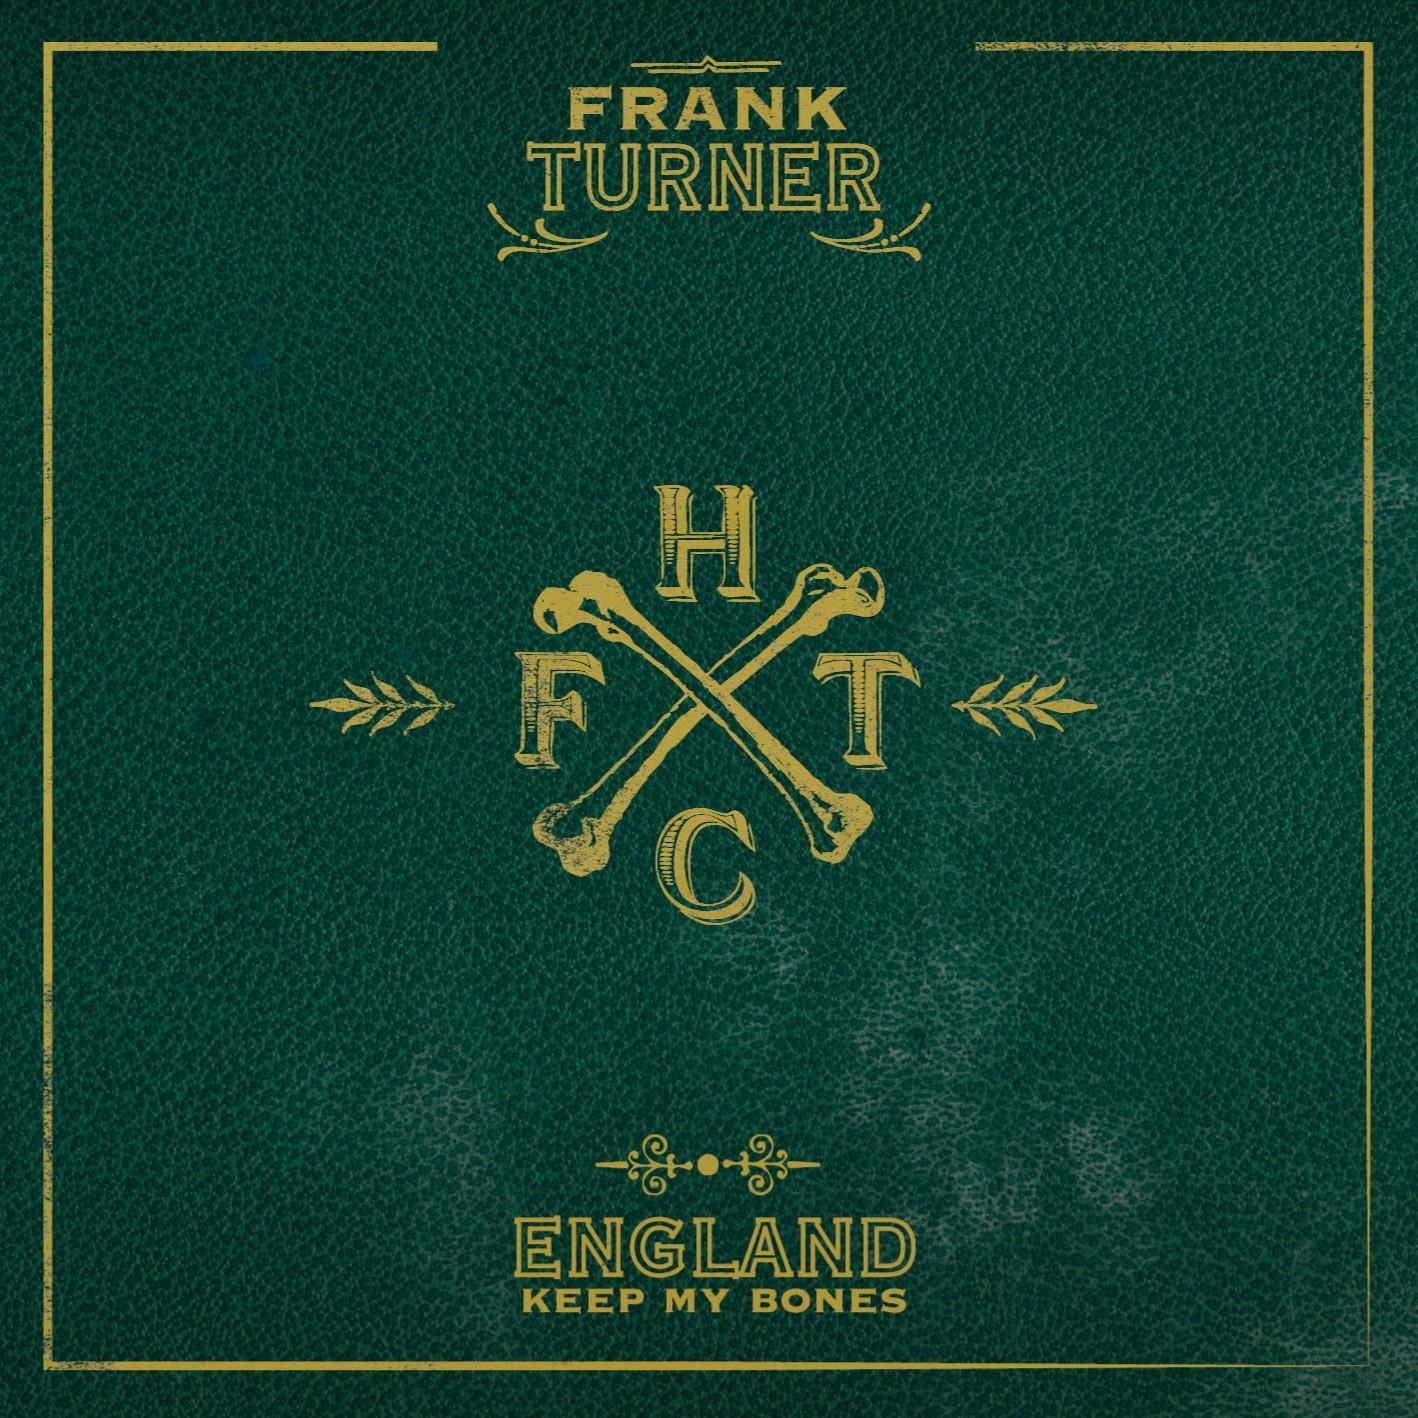 Frank Turner - England Keep My Bones LP